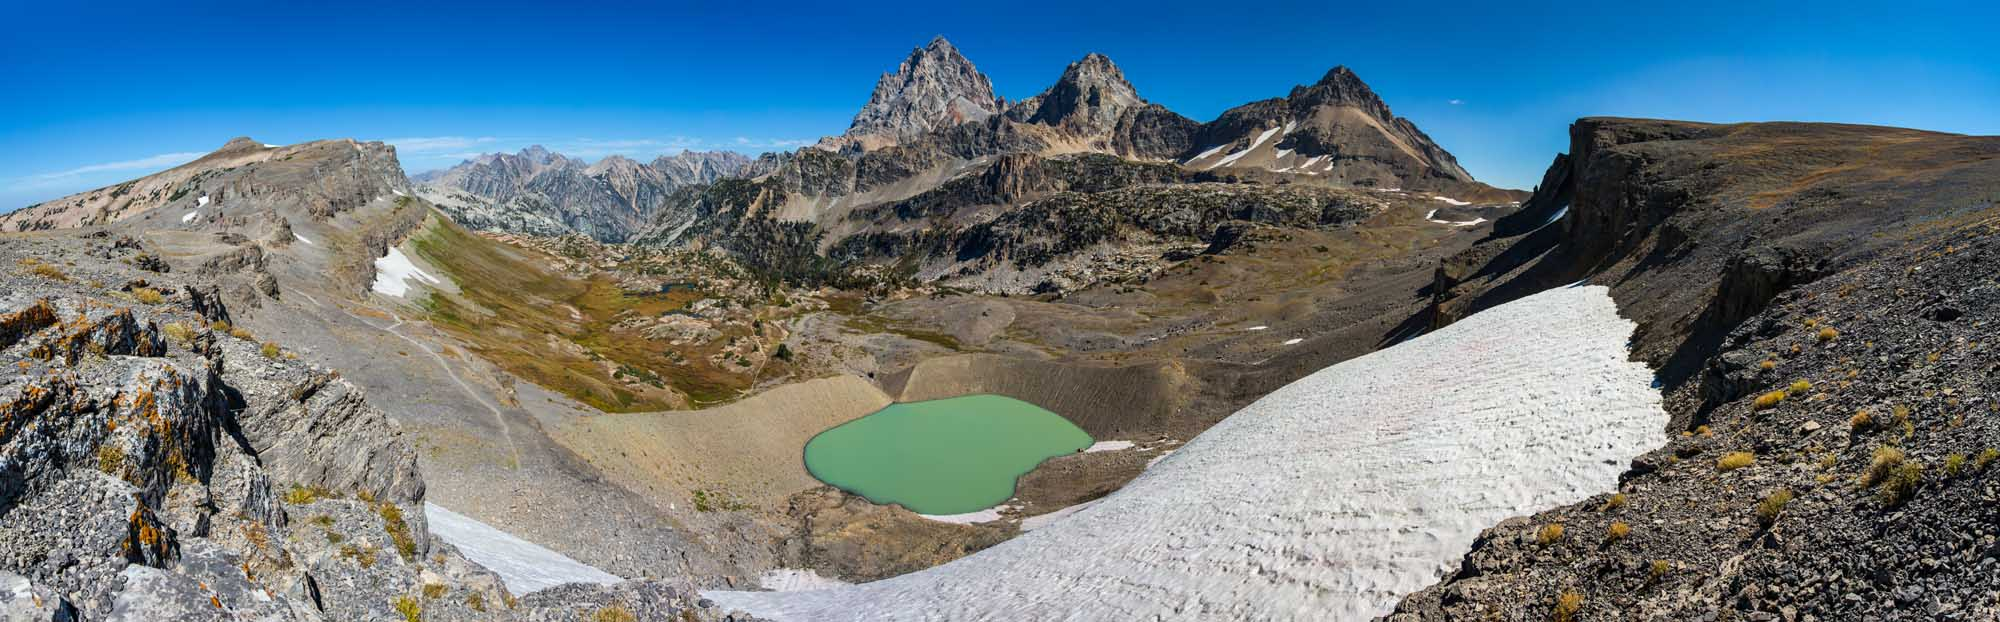 Untitled_Panorama2 (5).jpg